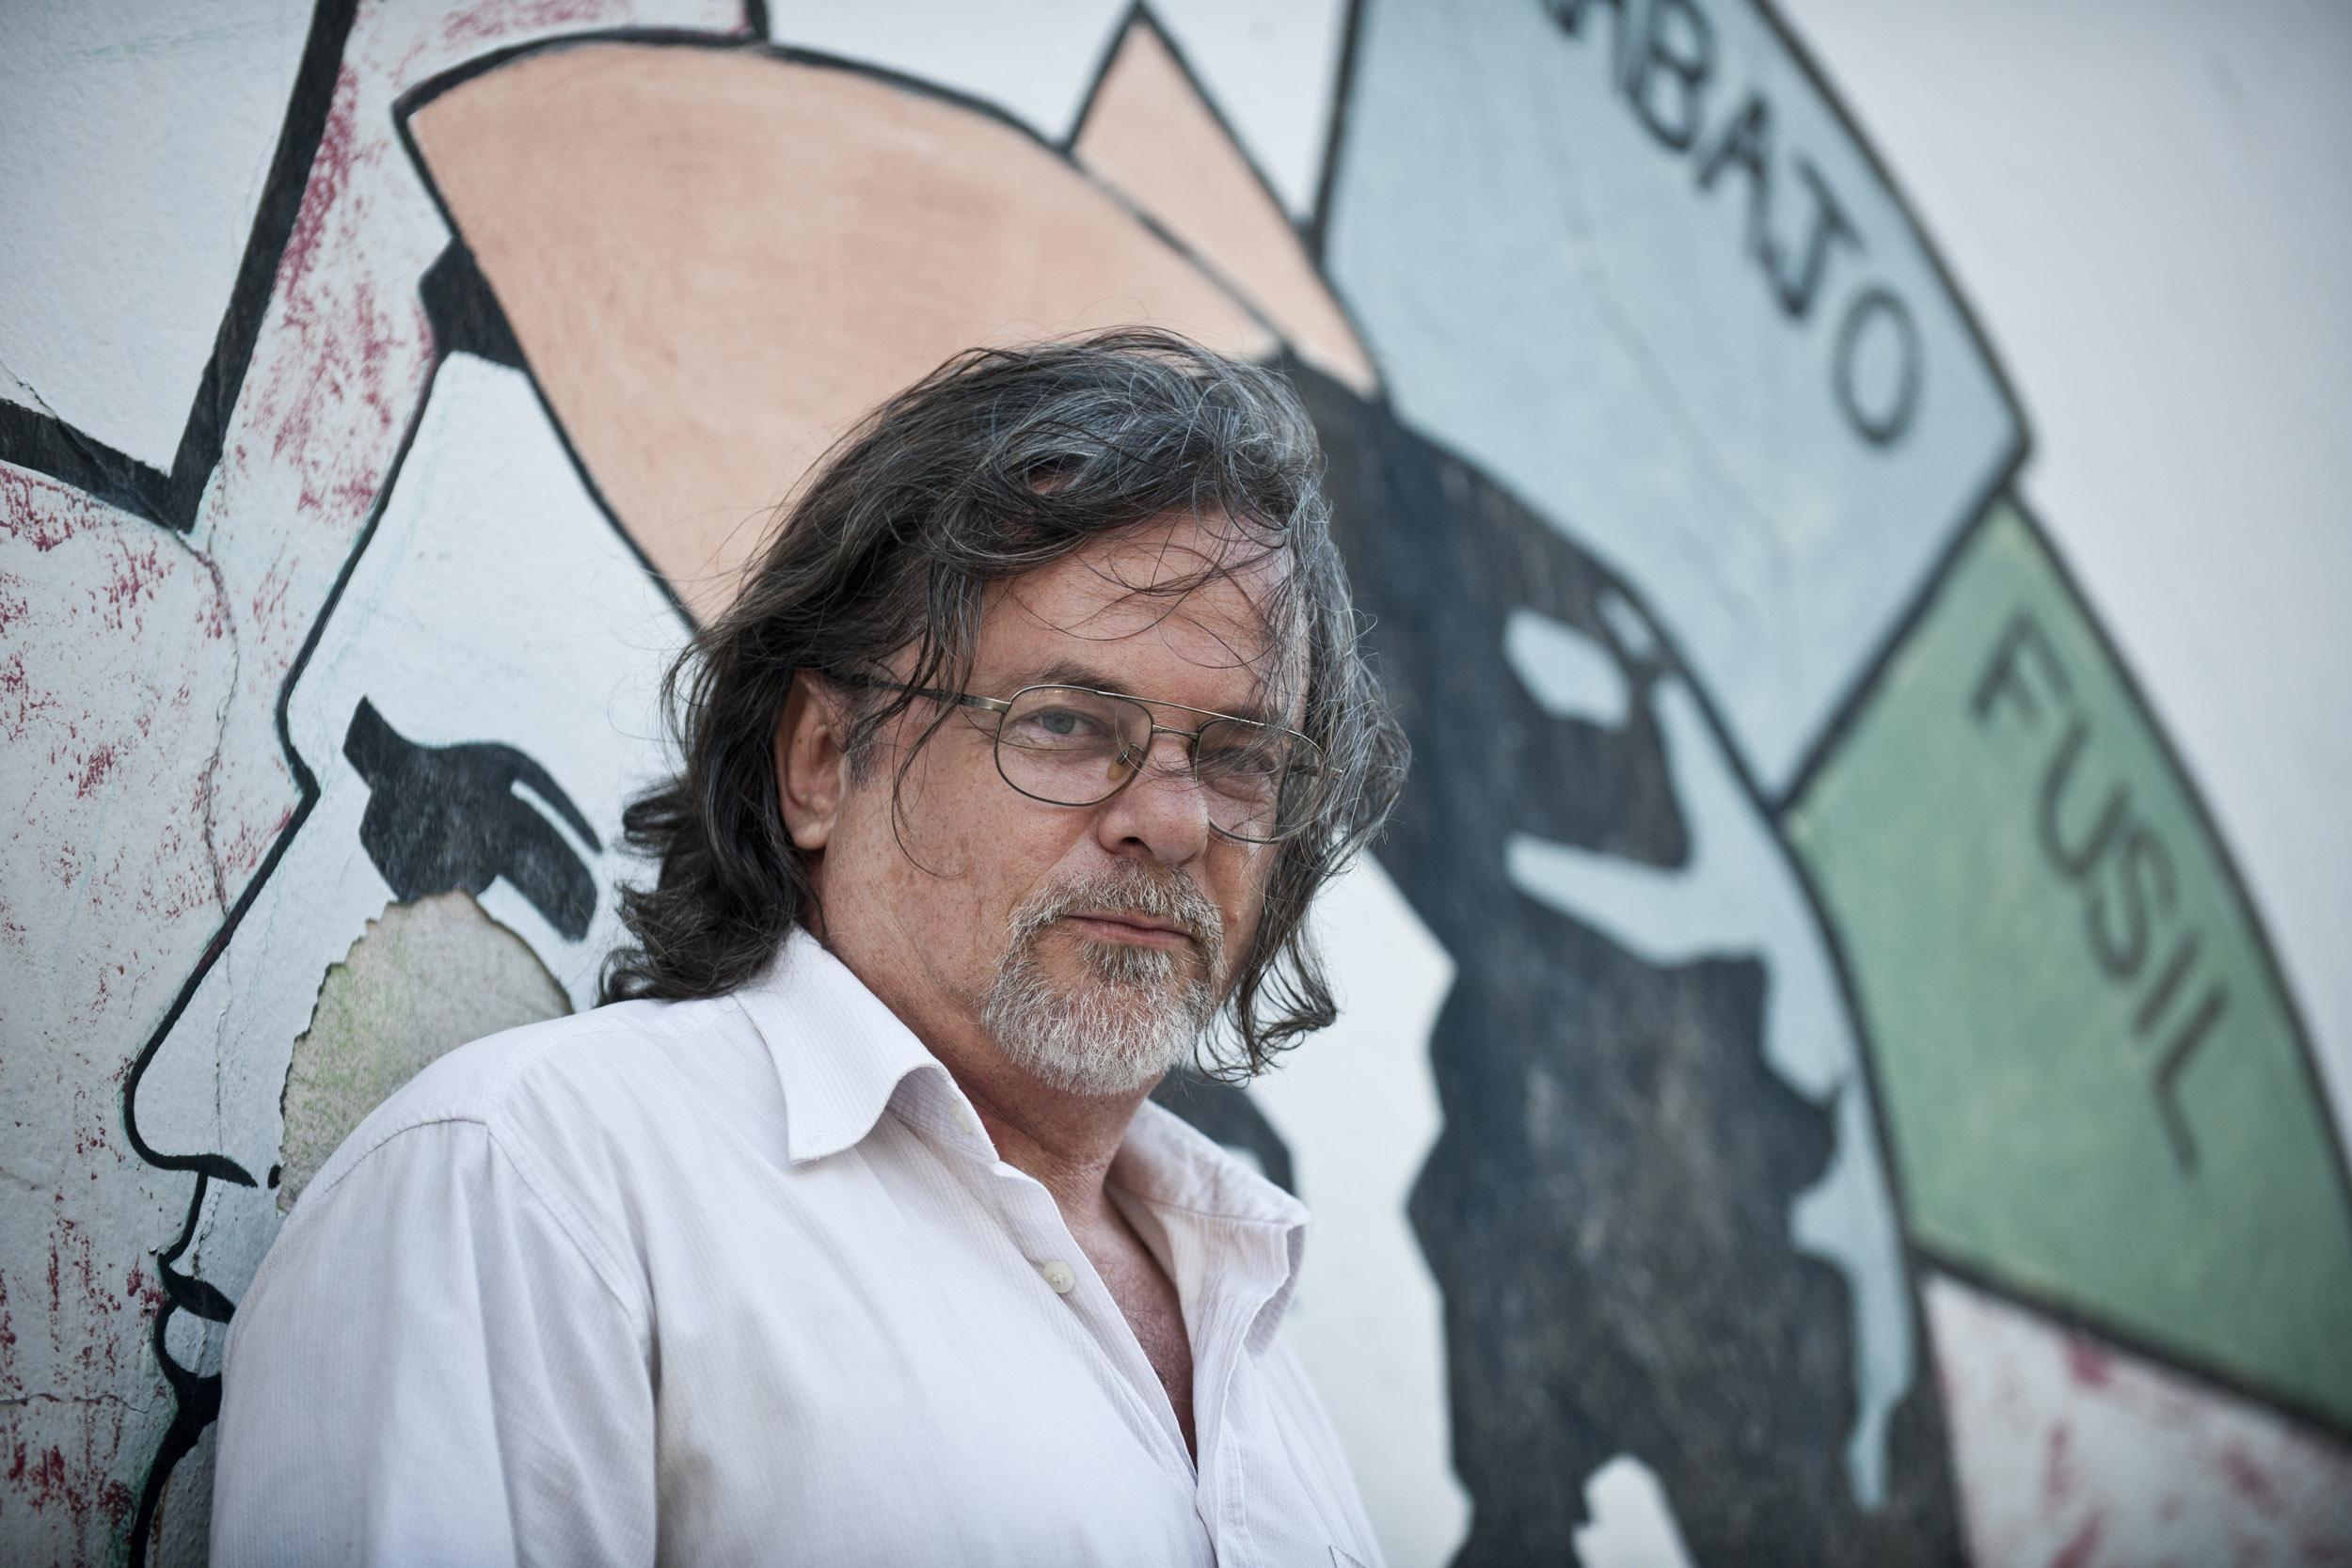 Eduardo del Llano, filmmaker - Illuminated Cuba - Hector Garrido, Aerial and human photography